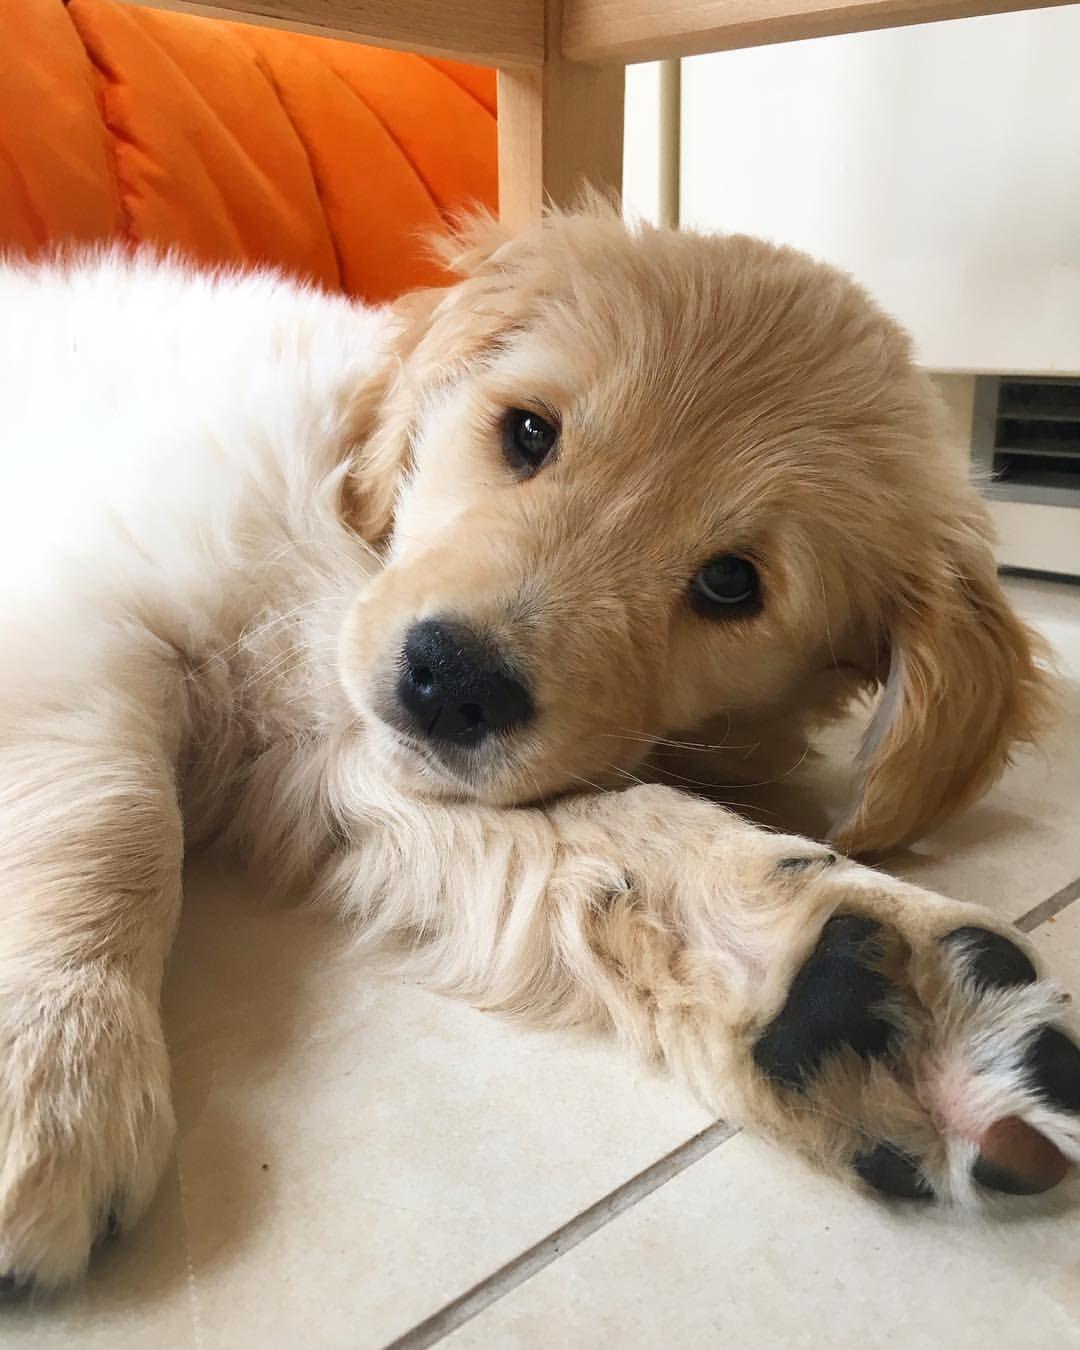 Pinterest catherinesullivan2017 Golden retriever, Dogs